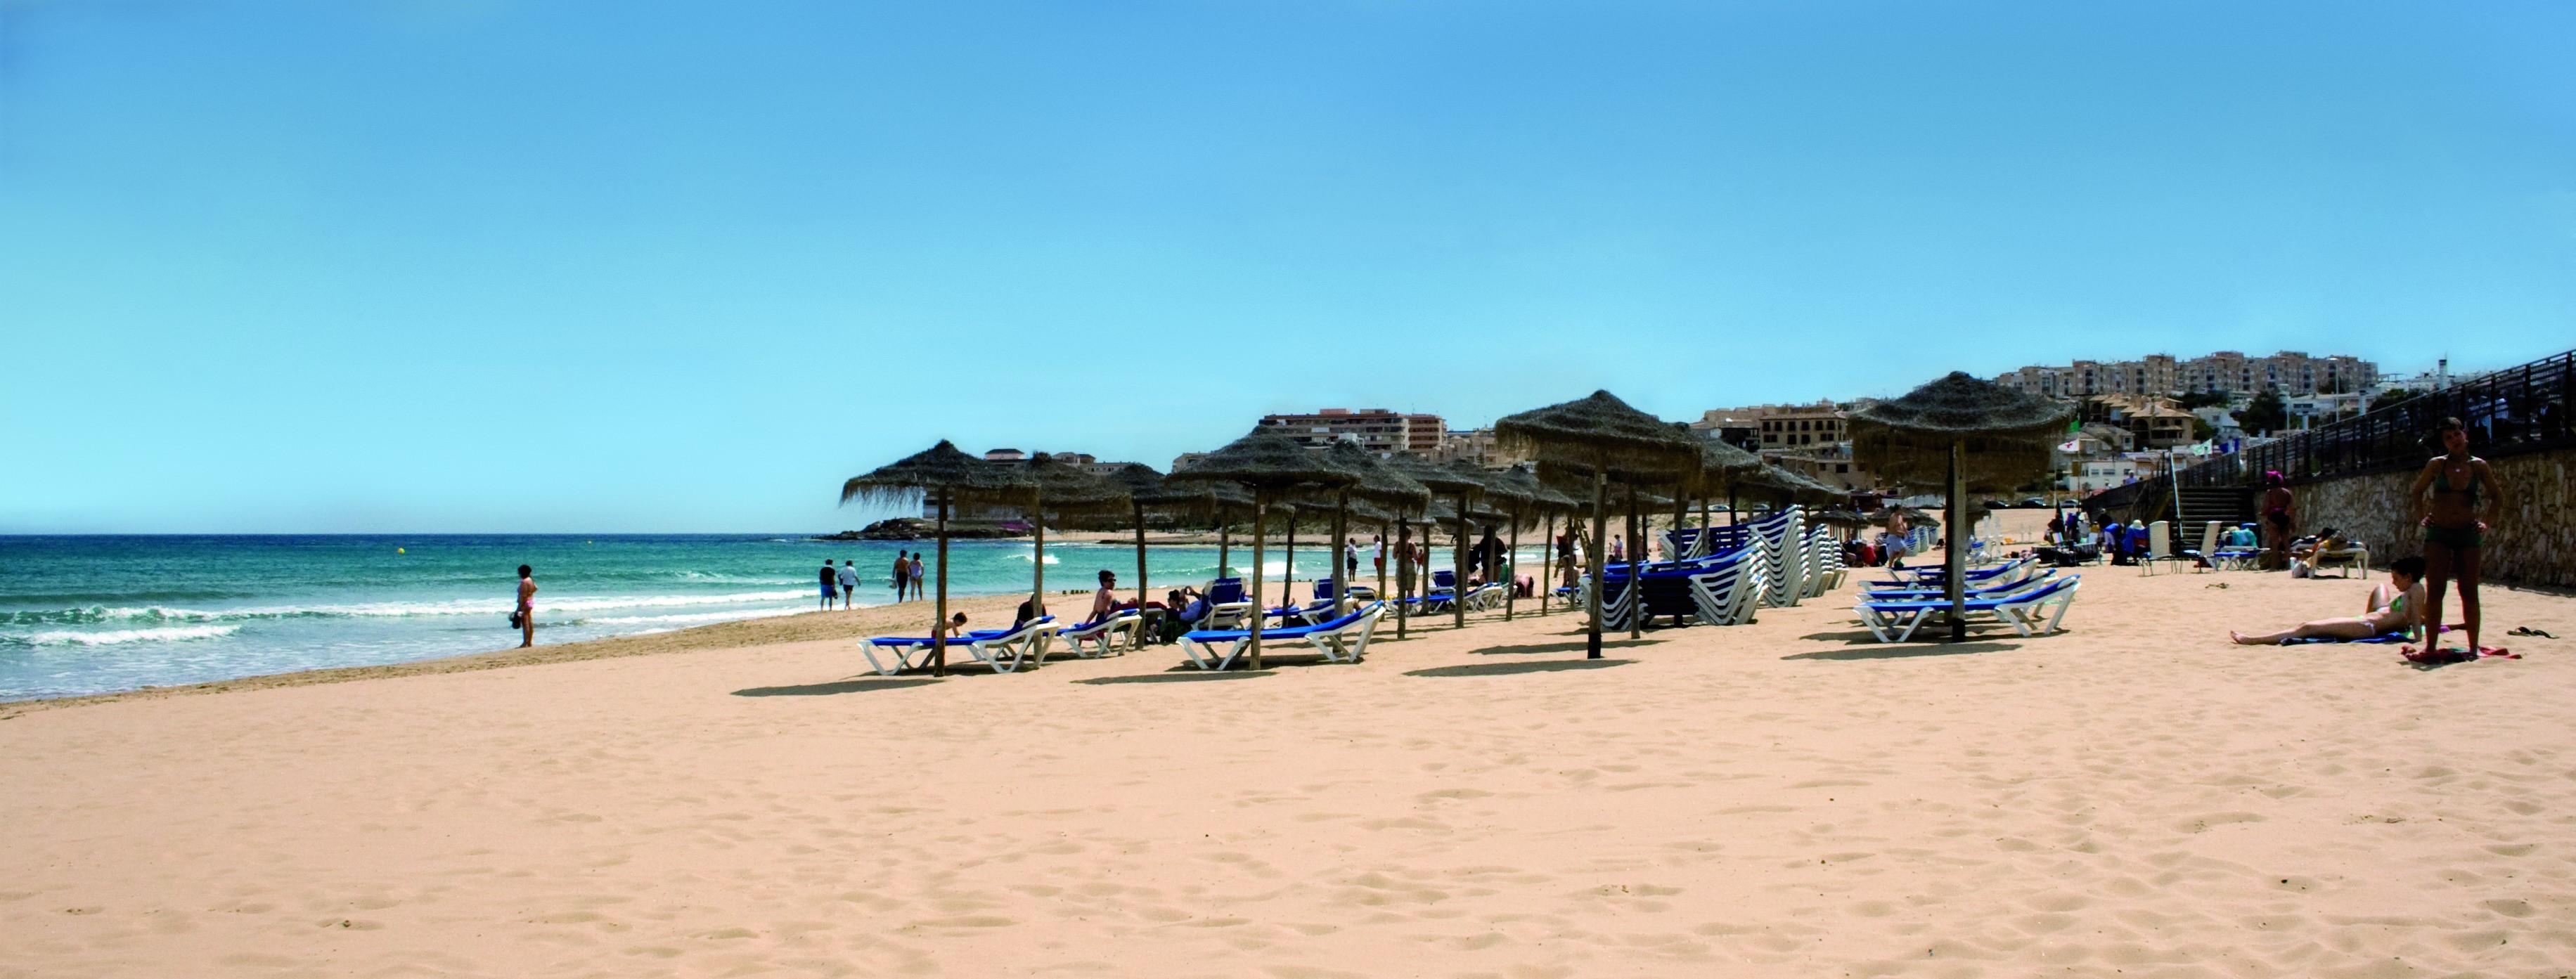 Fallece Un Hombre En La Playa De La Mata